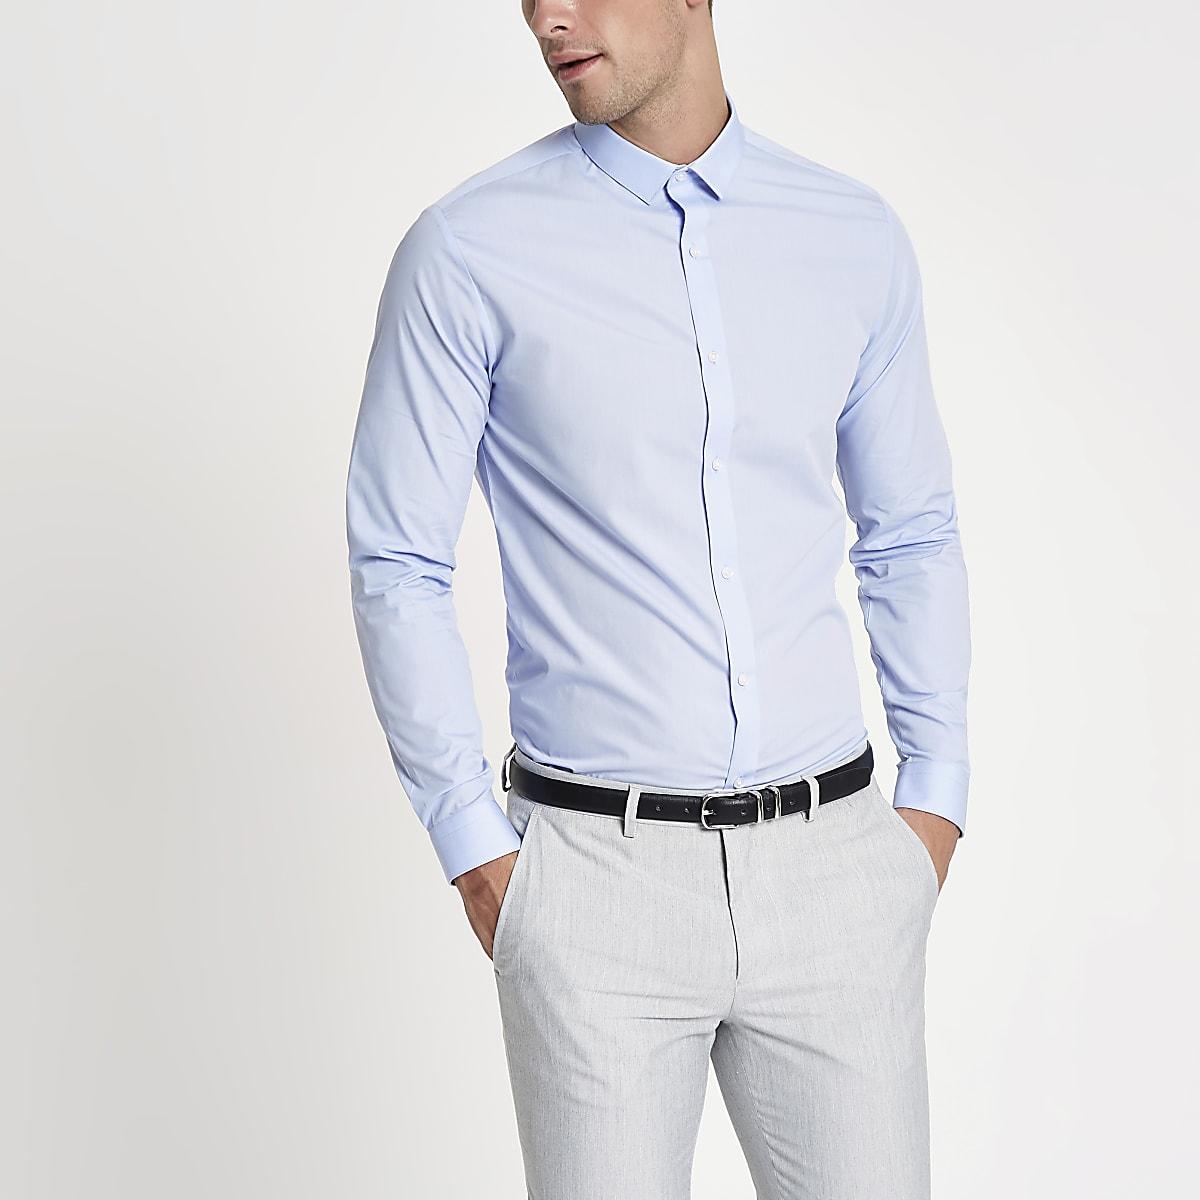 Lichtblauw slim-fit overhemd met lange mouwen